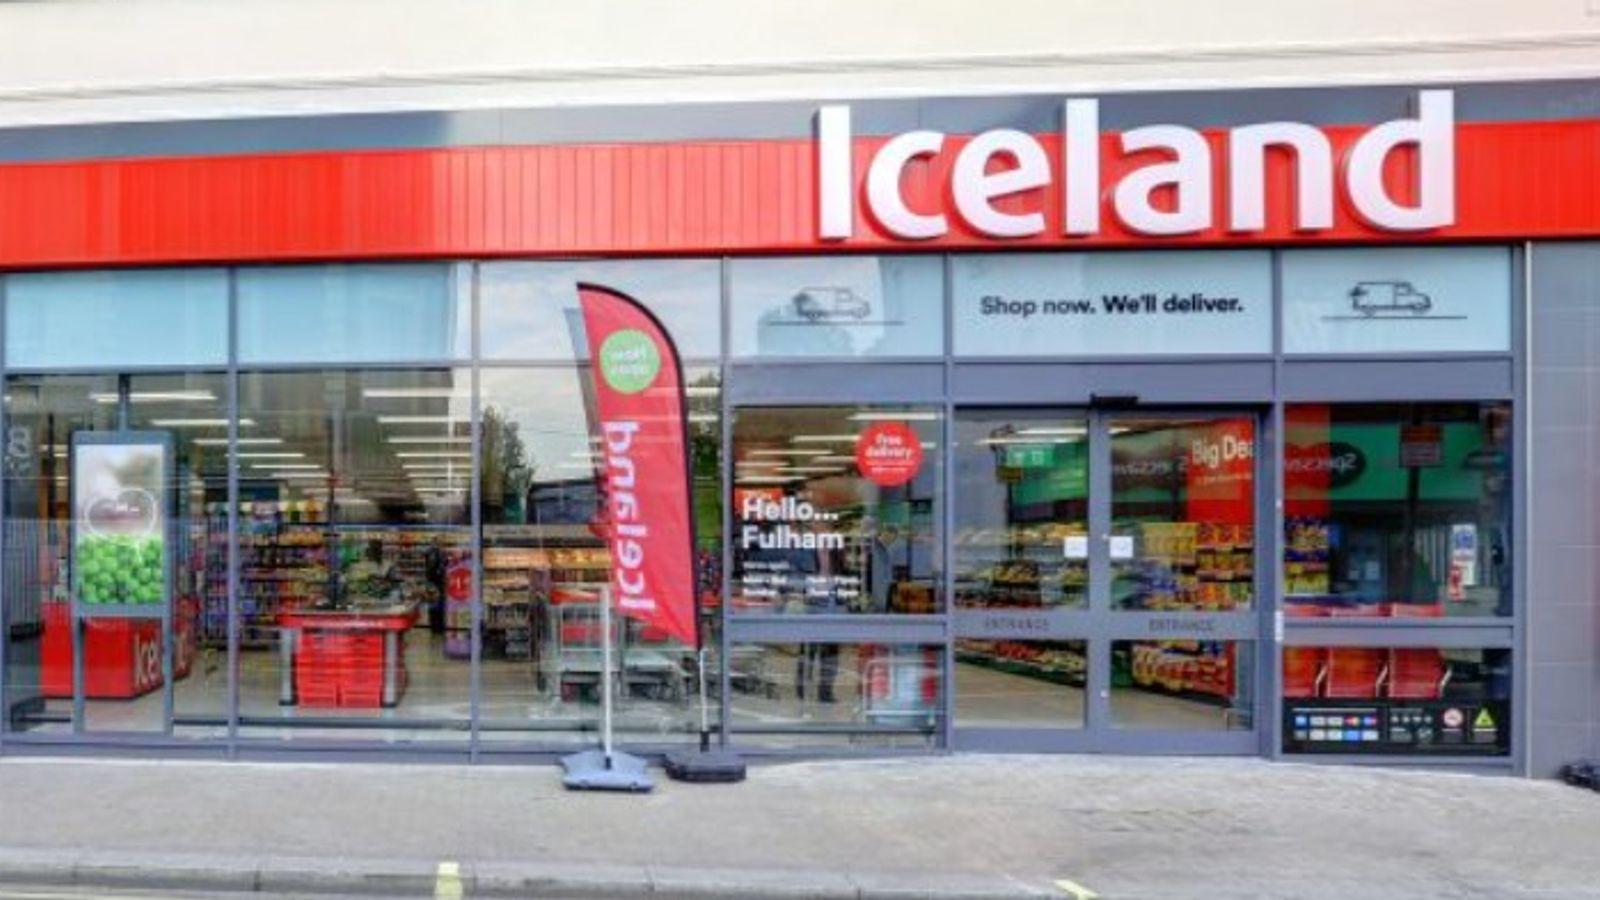 skynews-iceland-store_5498390.jpg?bypass